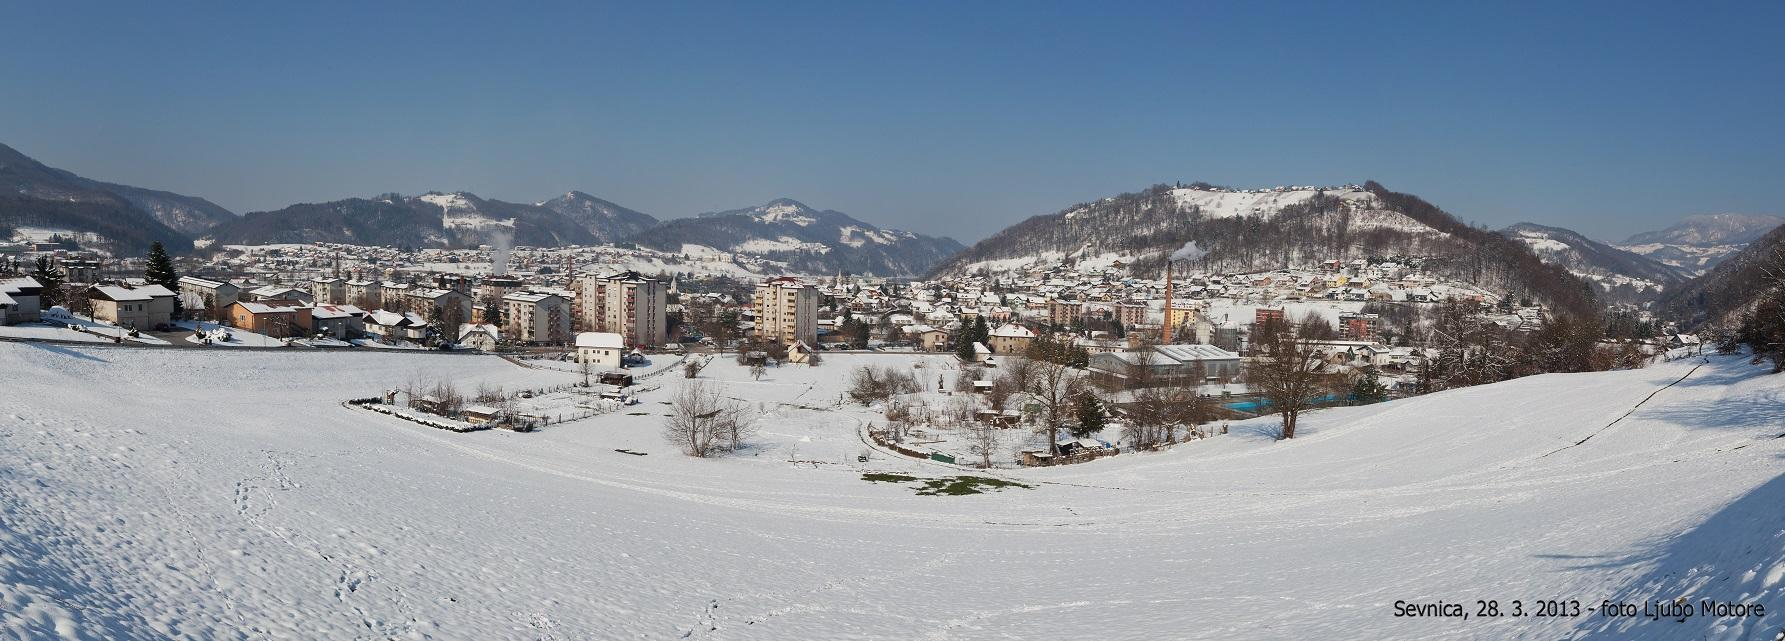 Sevnica, veliki četrtek, sneg, Kruhek, Lisca